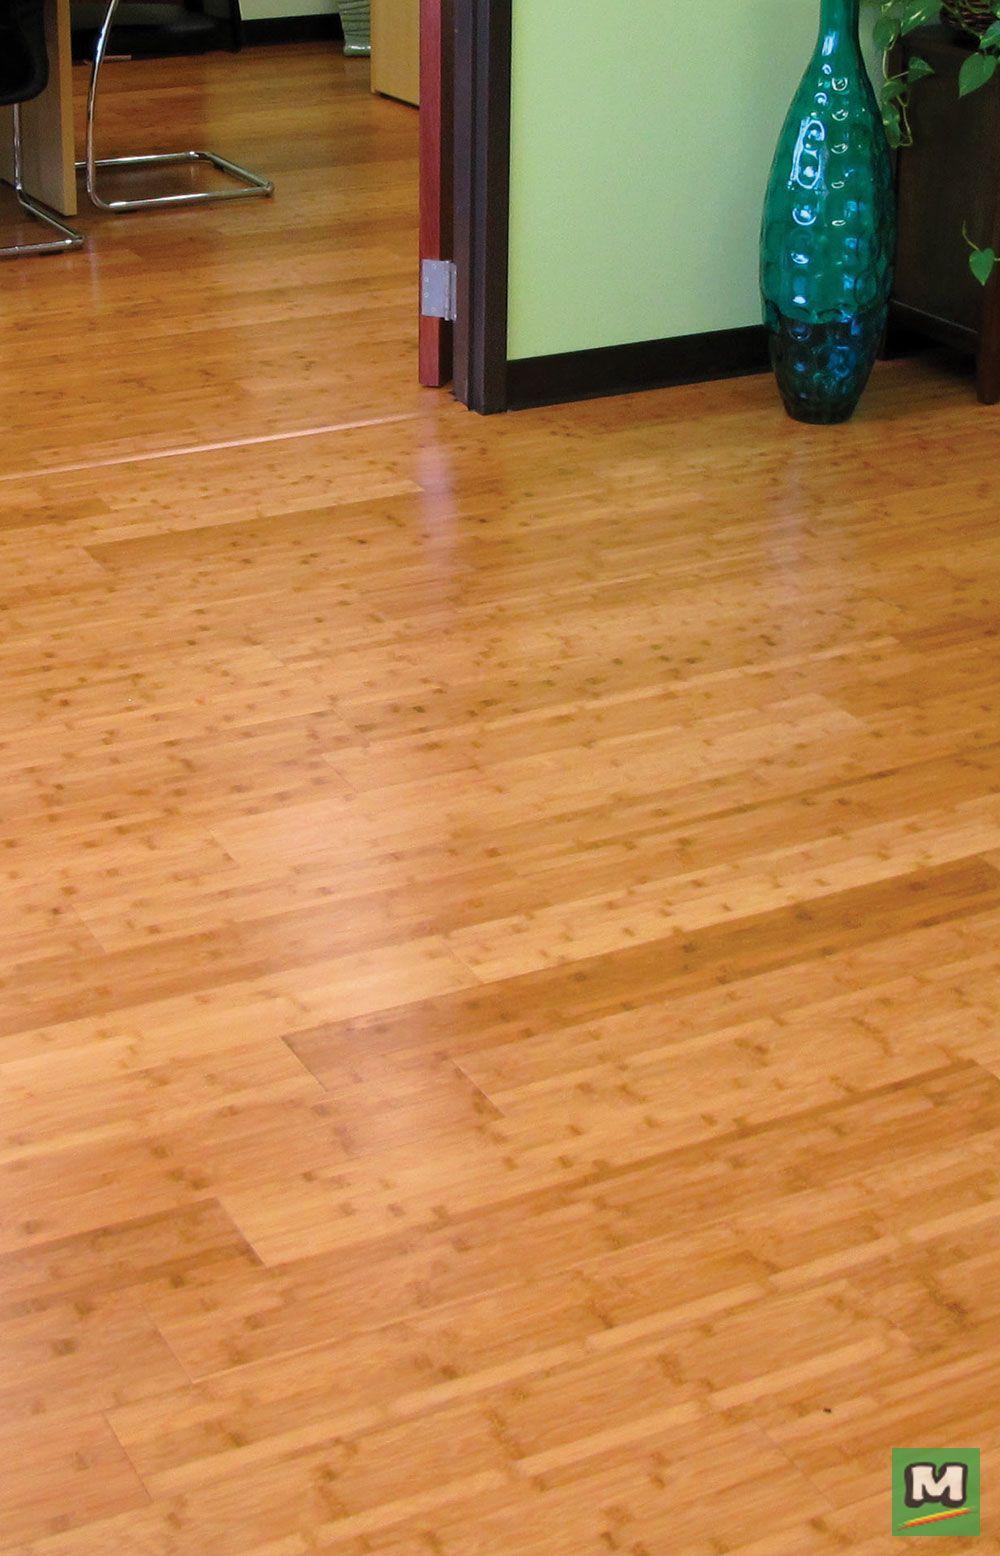 Floors Of Distinction 3 8 X 5 Honey Bamboo Engineered Hardwood Flooring Offers Ease Of Installation And Lasting B Flooring Hardwood Floors Engineered Hardwood